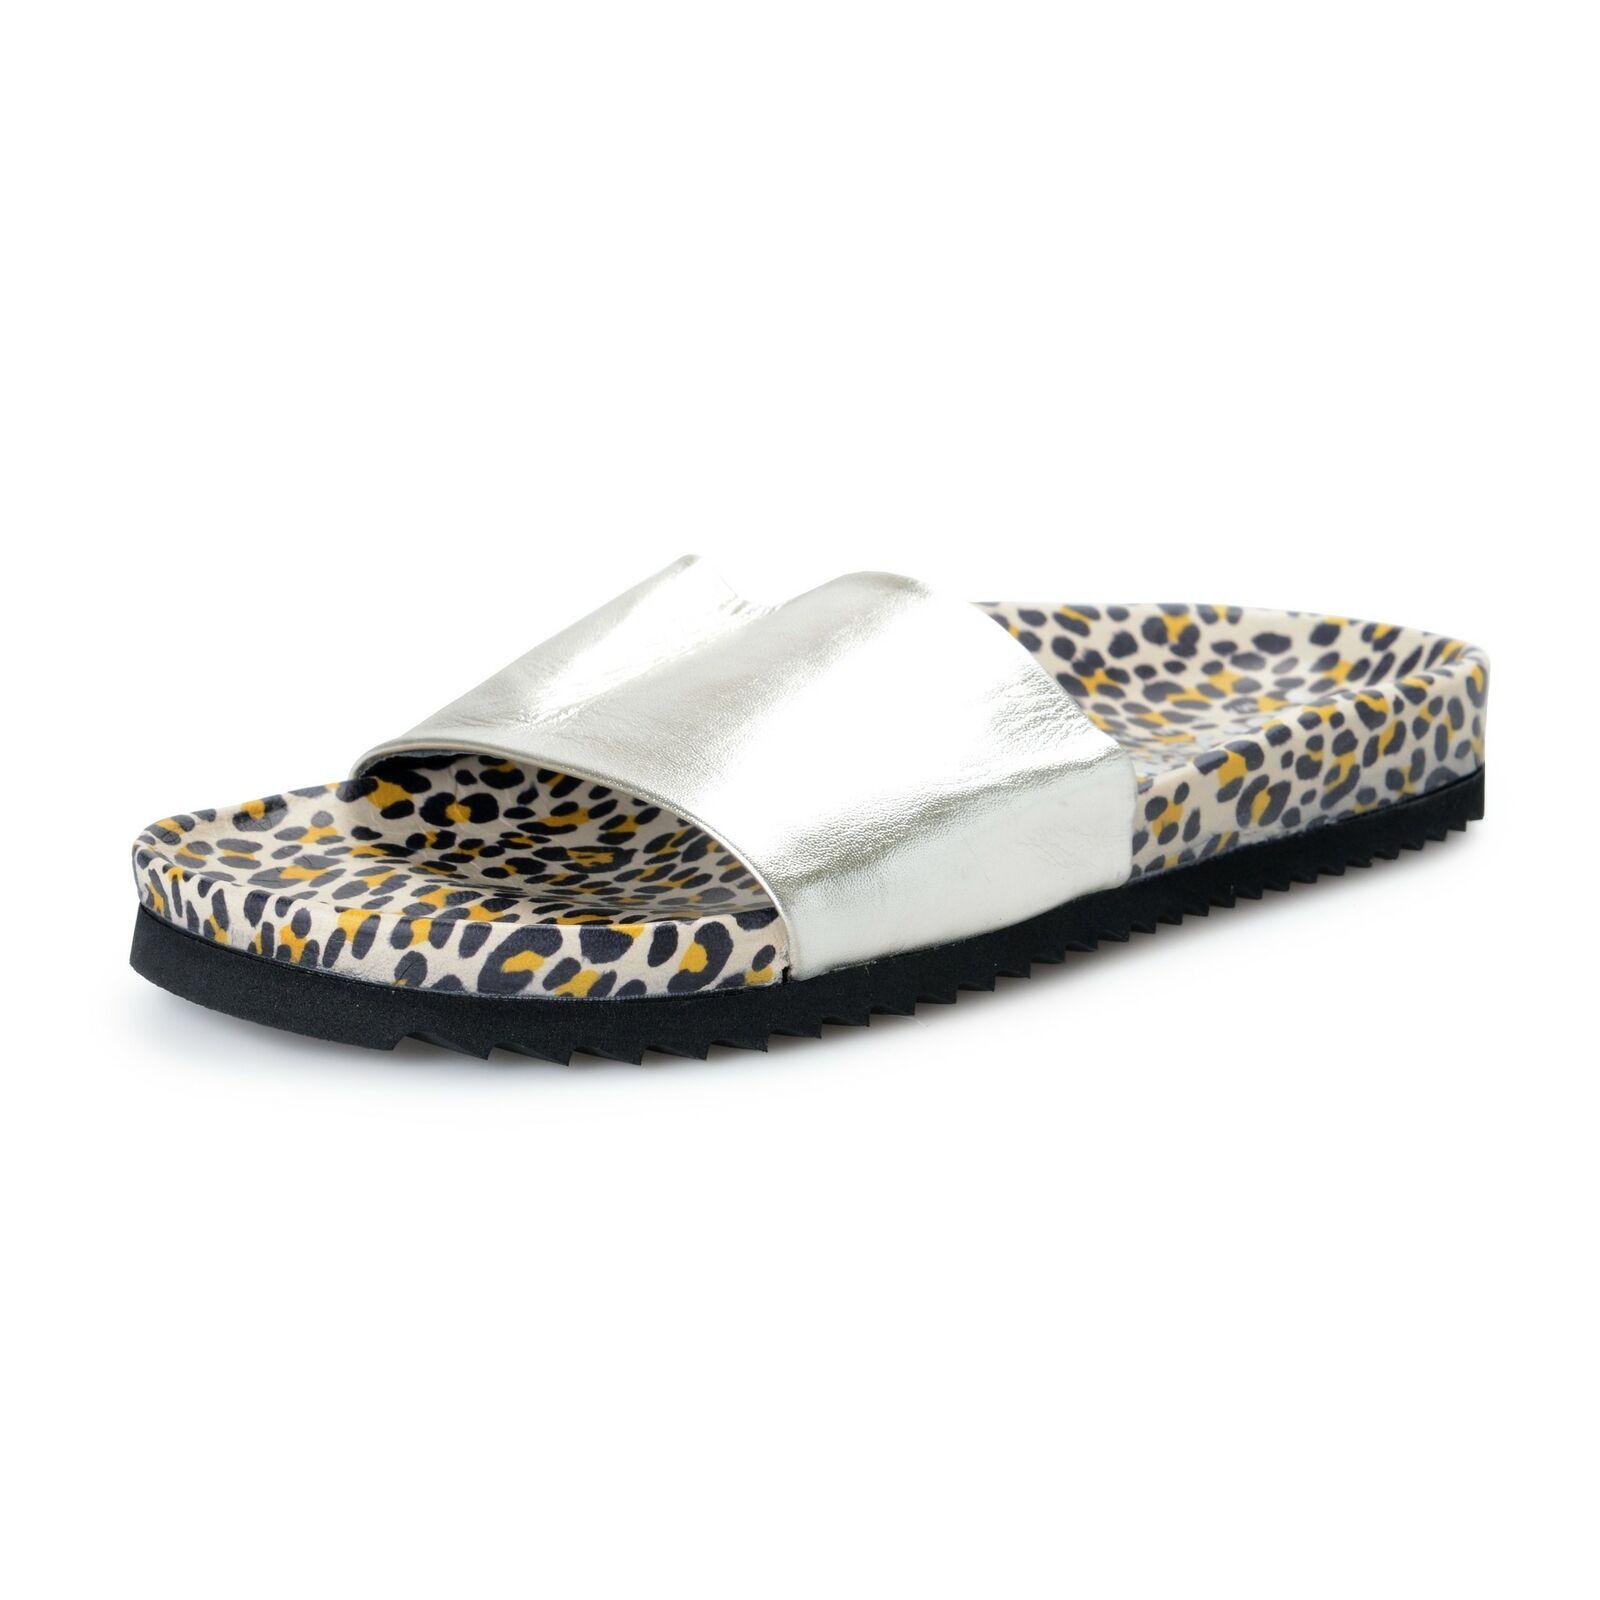 Just Cavalli Damen Leder Silber Zehentrenner Schuhe US 9 It 39